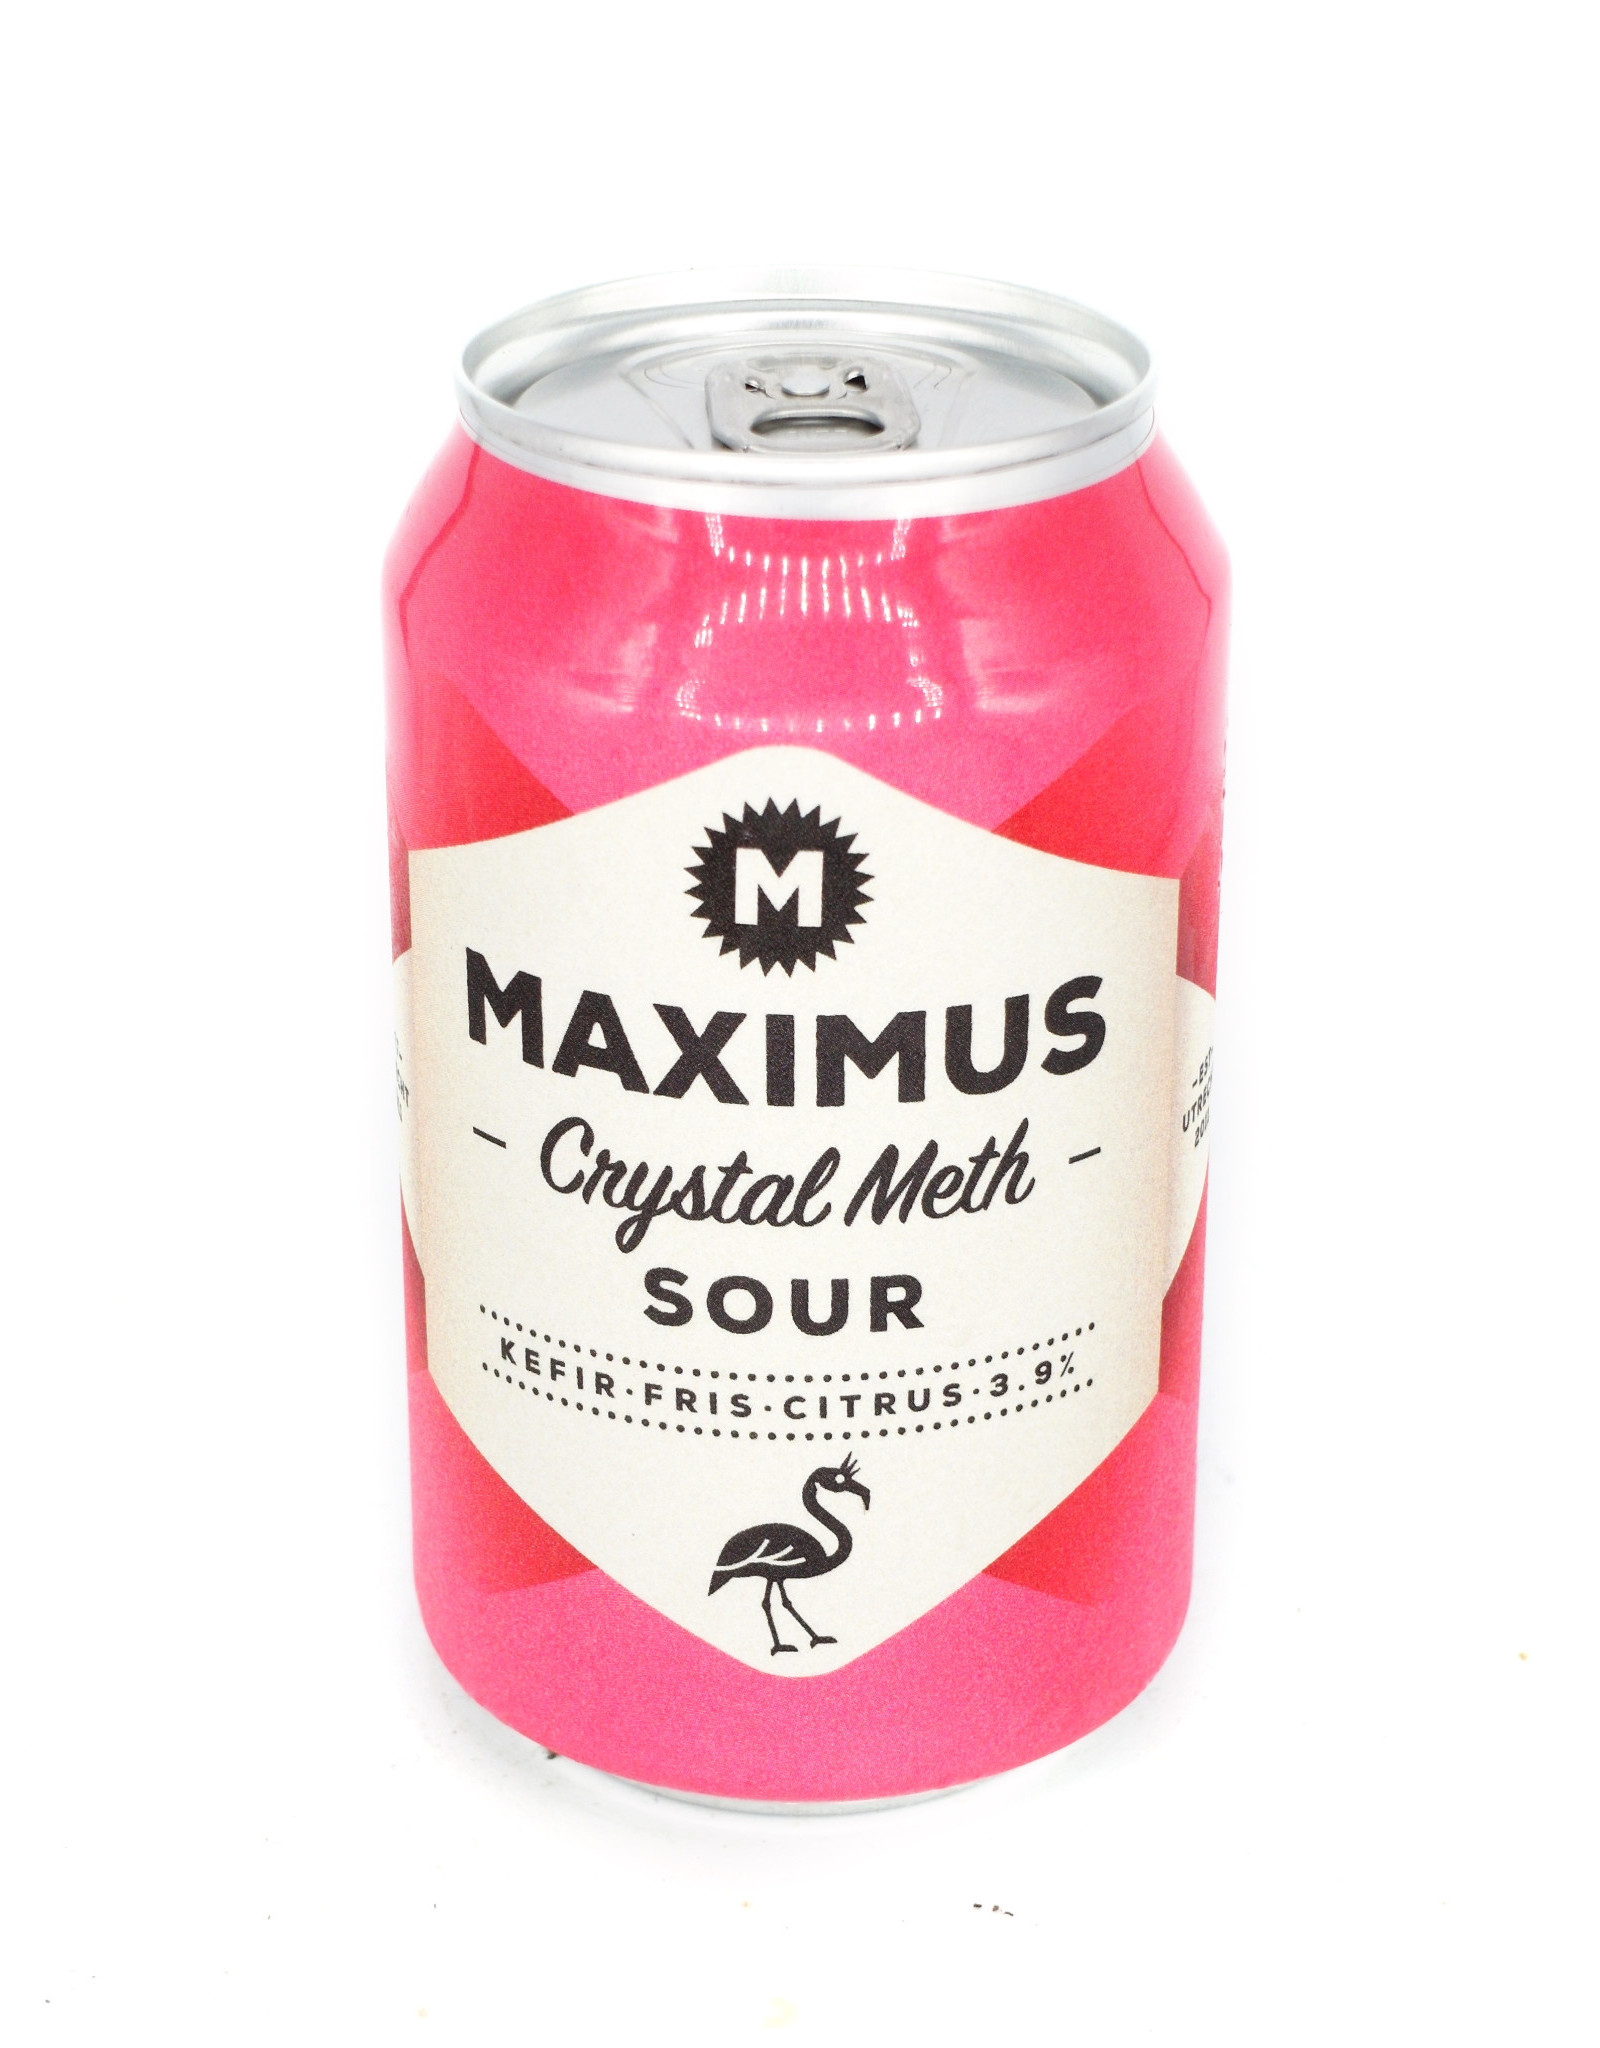 Maximus Maximus: Crystal Meth